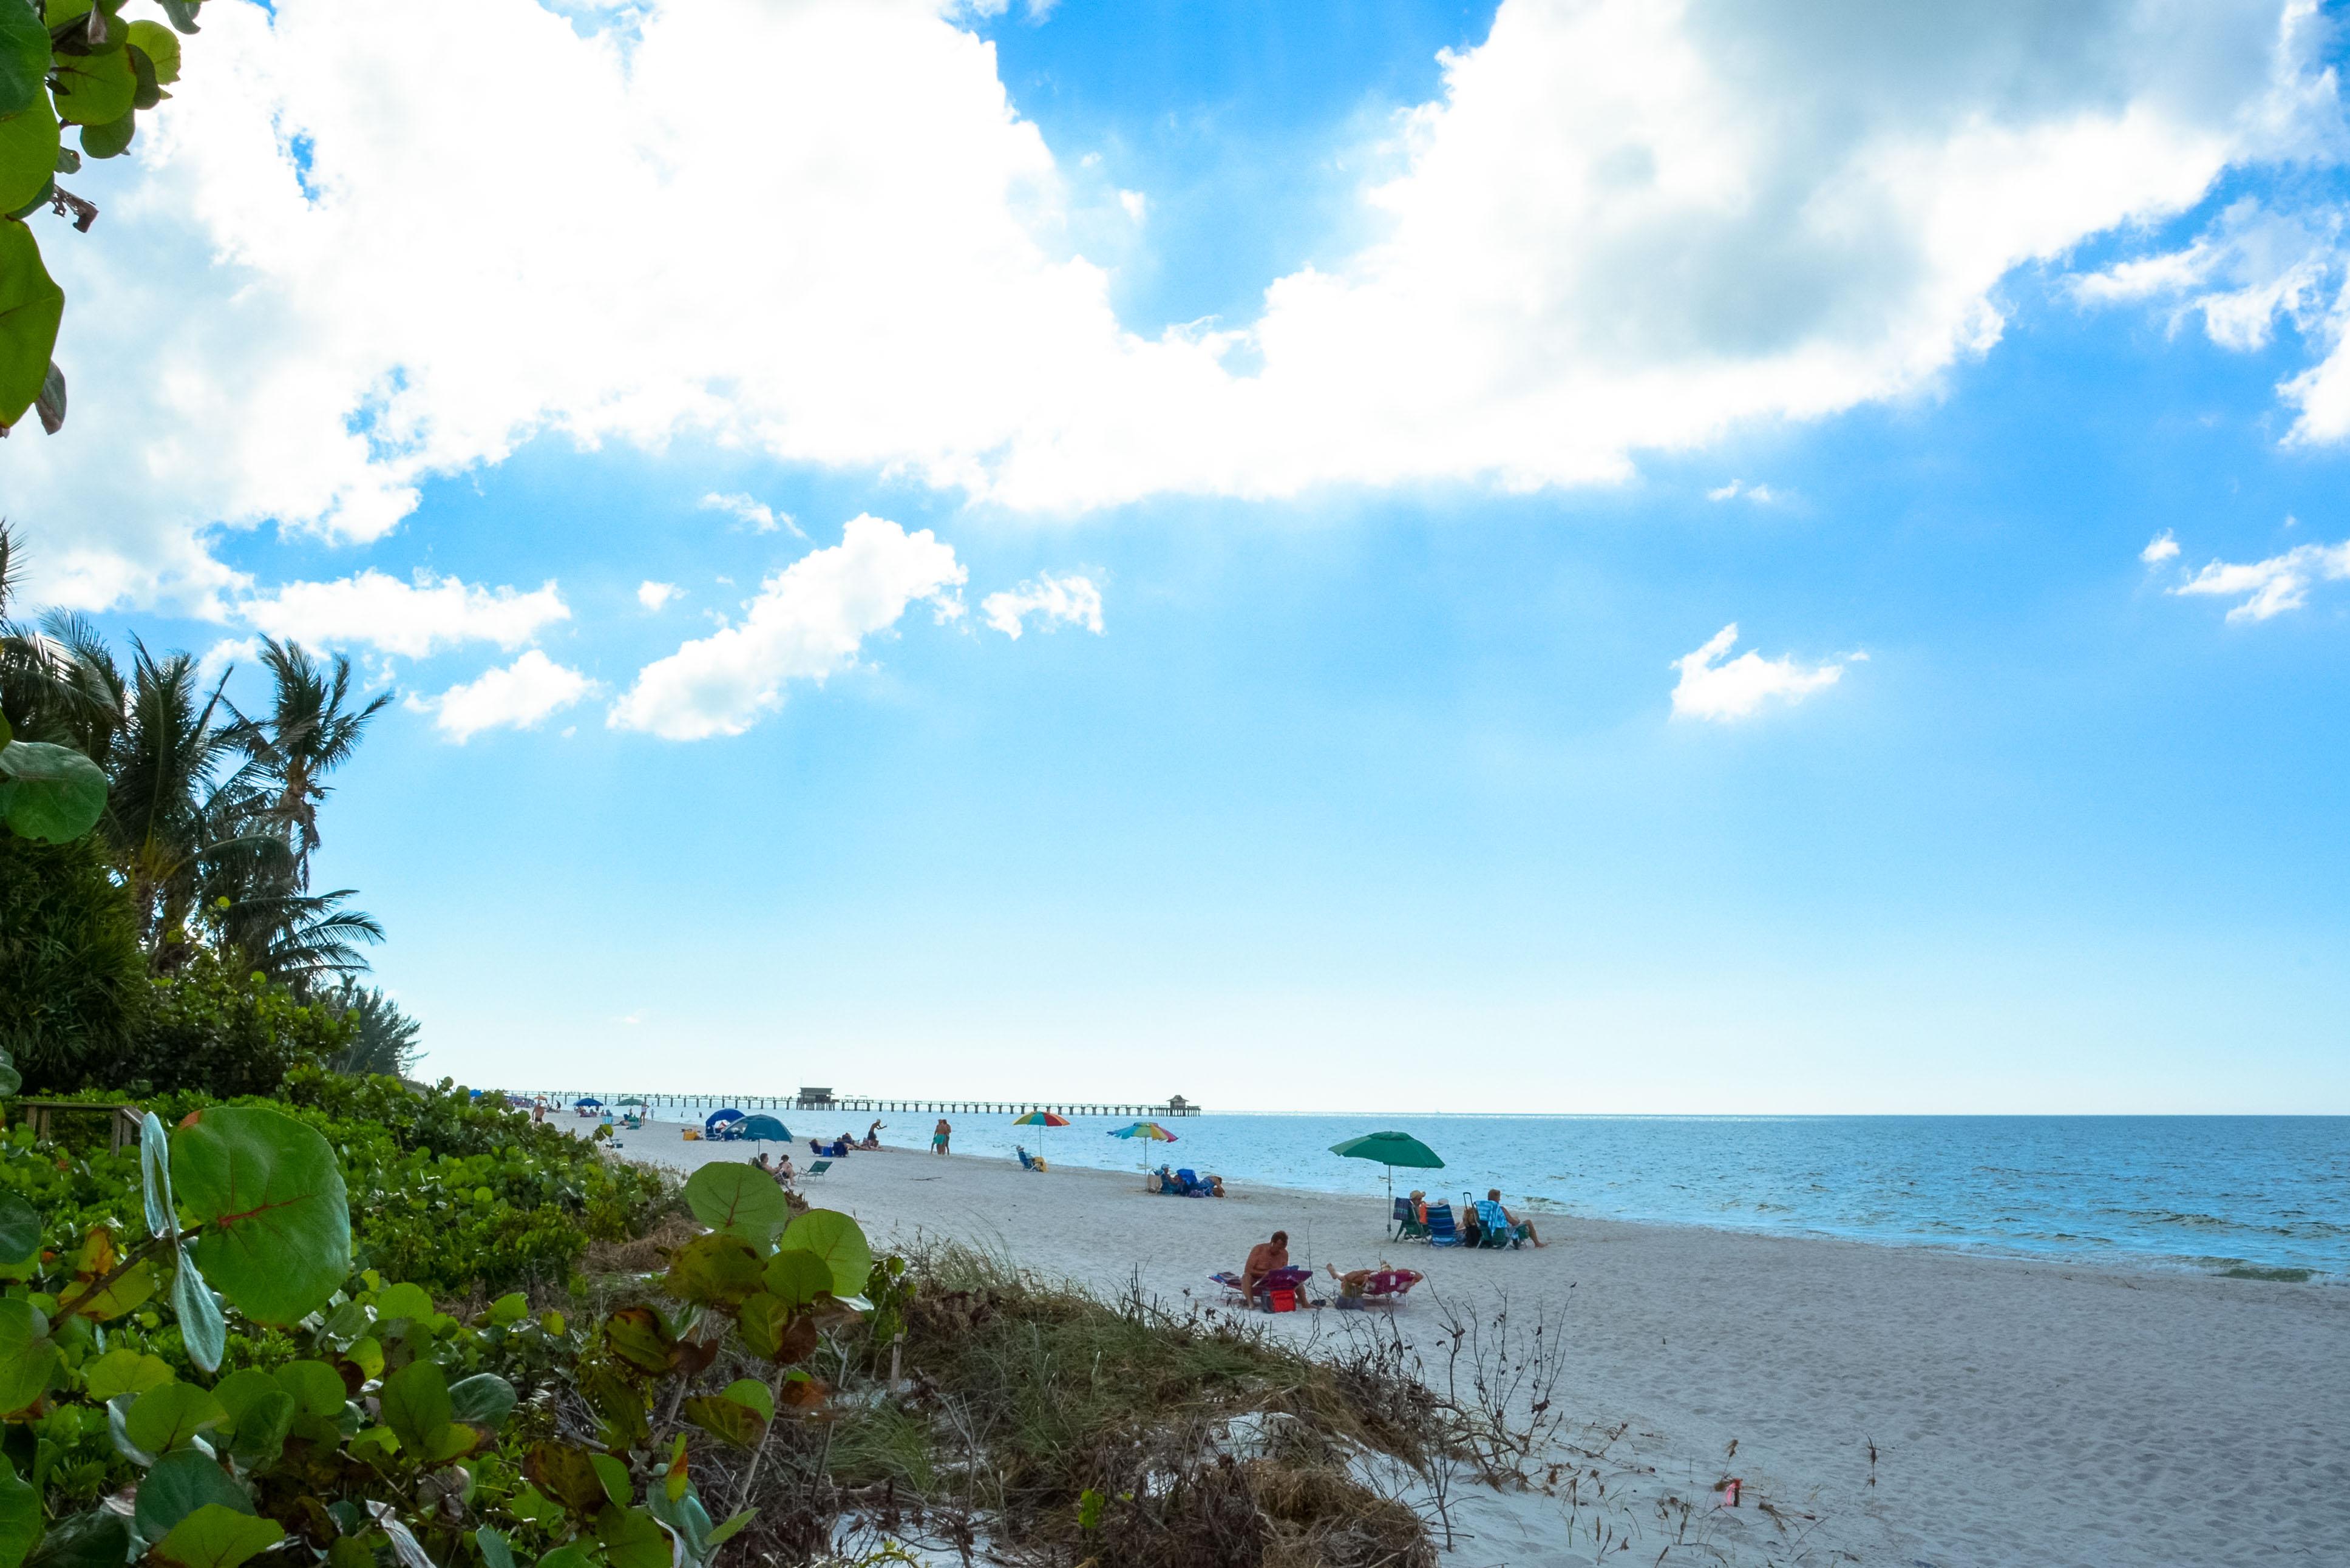 Floridas Strände, Key West, Higgs Beach, Clearwater Beach, Sanibel Island, Panama City Beach Shell Island, Gulfport Beach, Cumberland Island, Ameila Island, Municipal Beach Palm Beach, Naples Beach